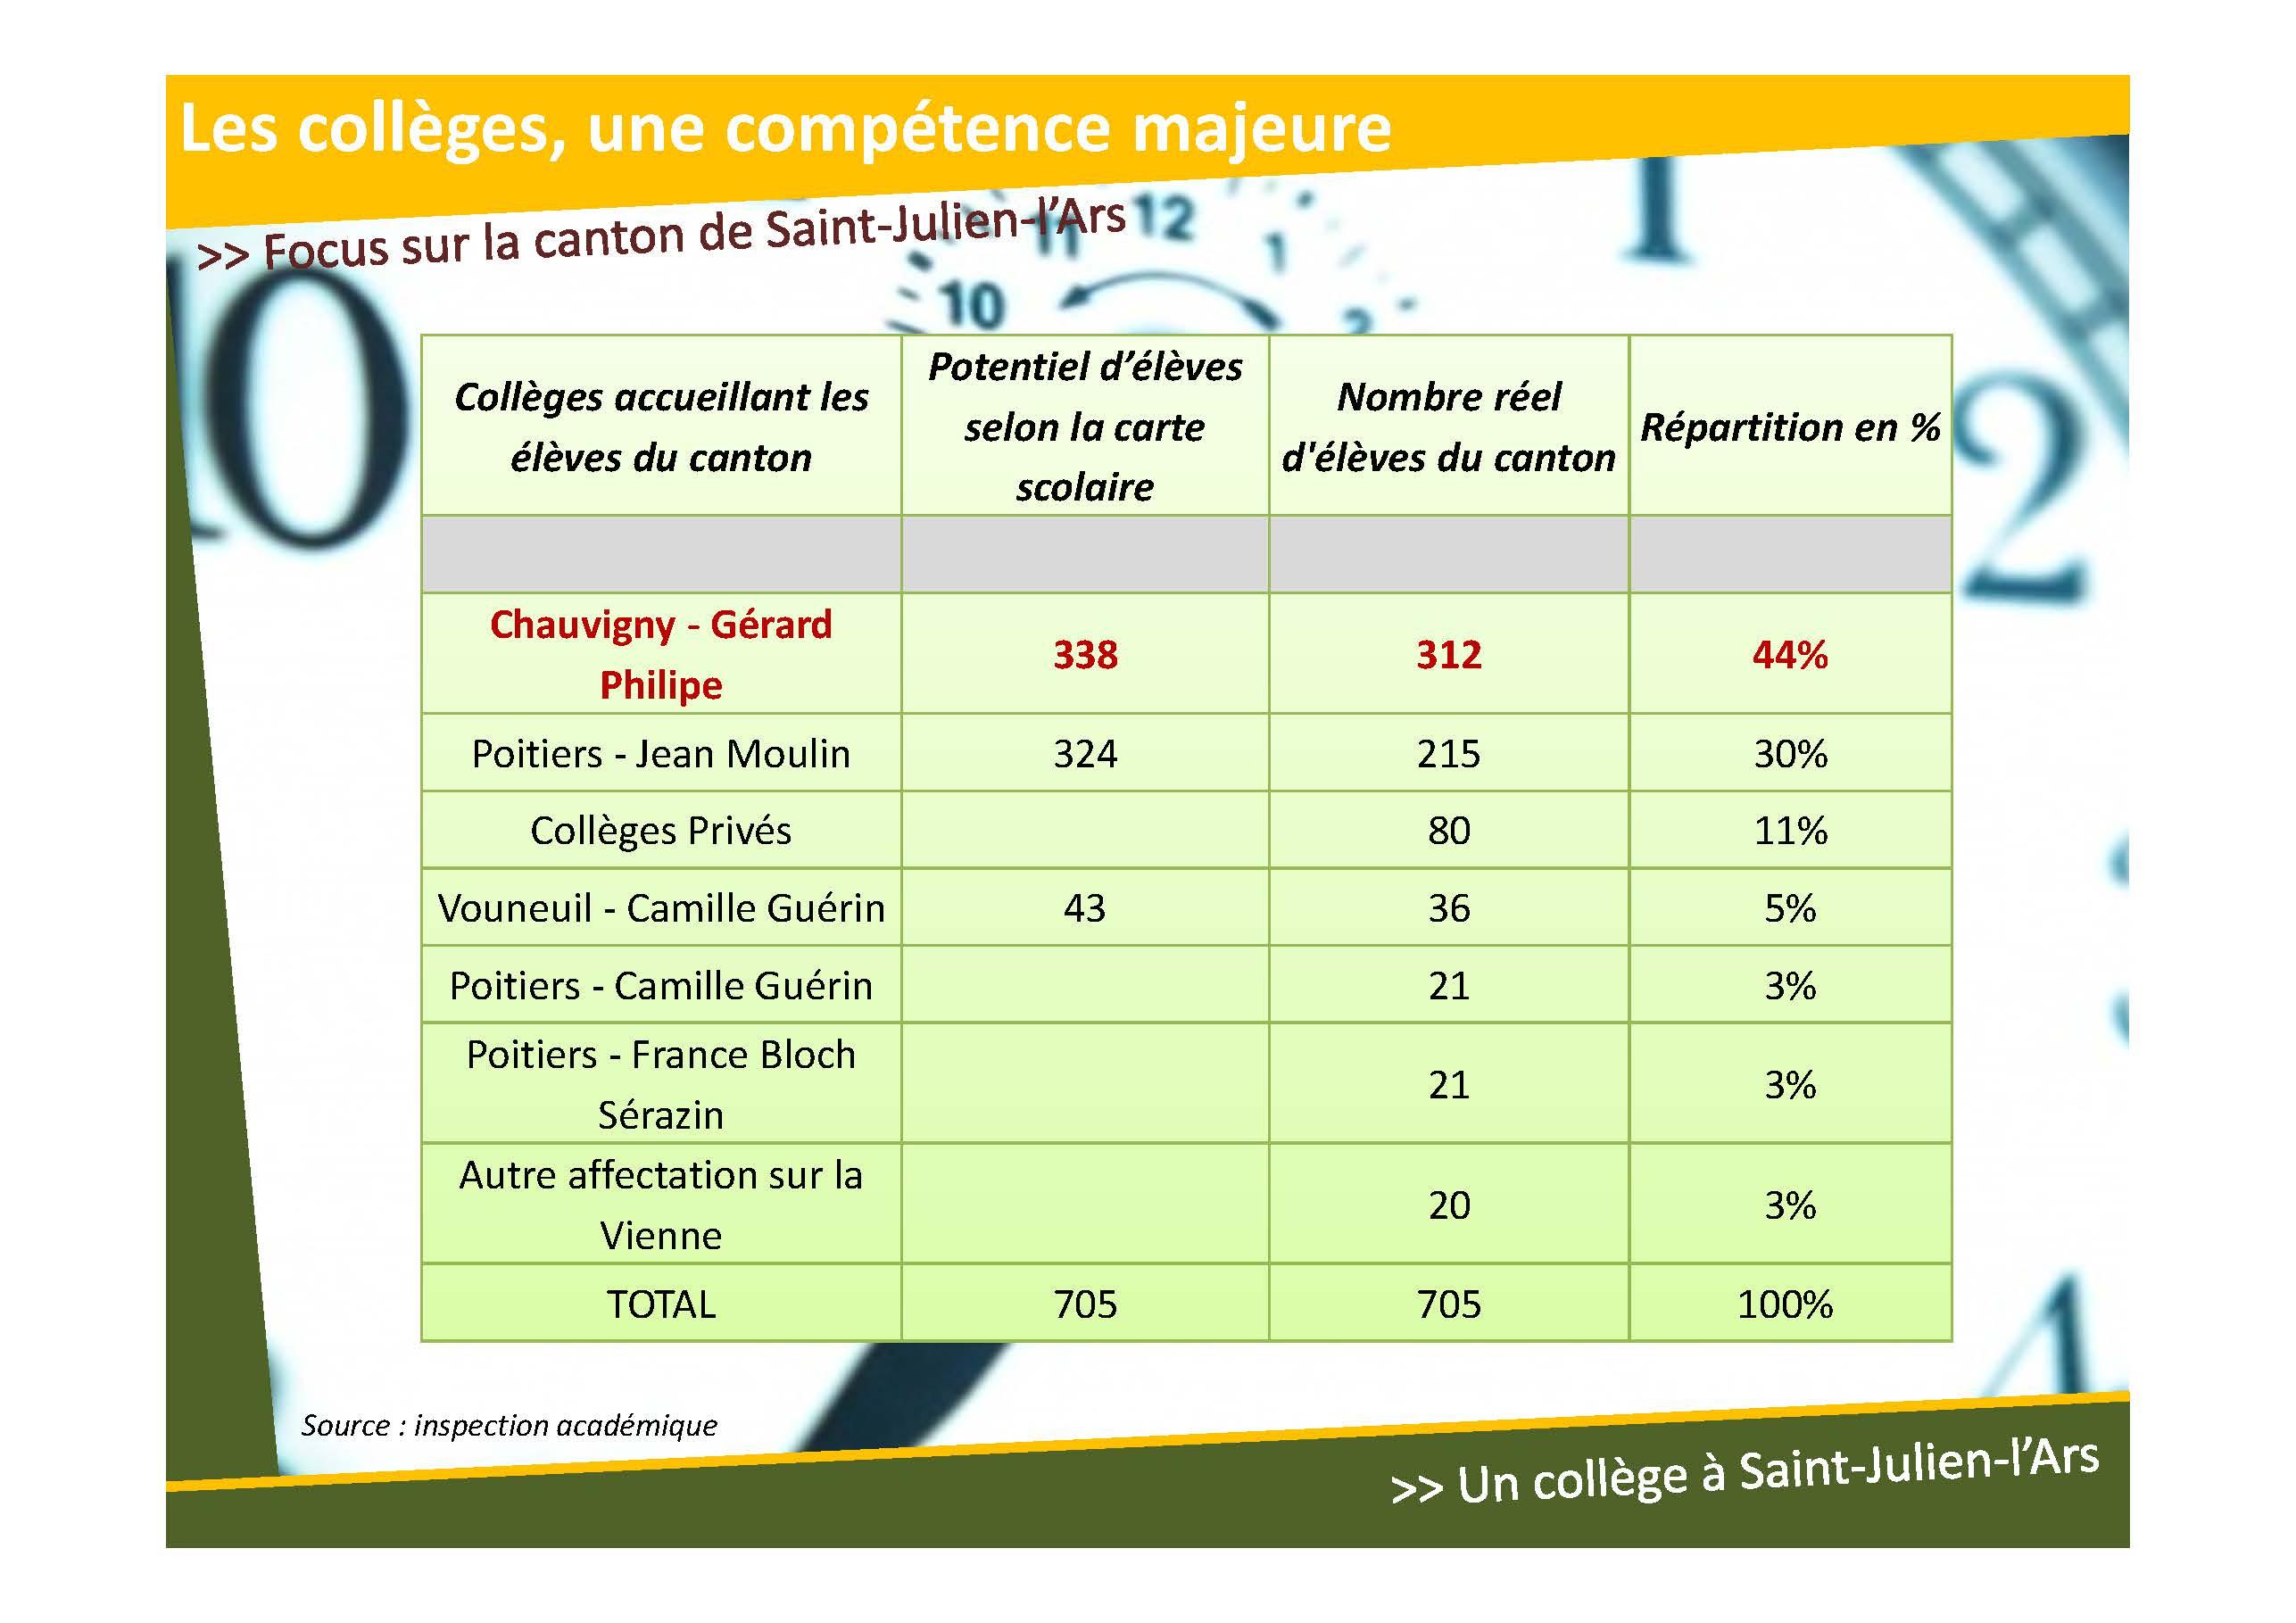 xaviermoinier-college_page_09